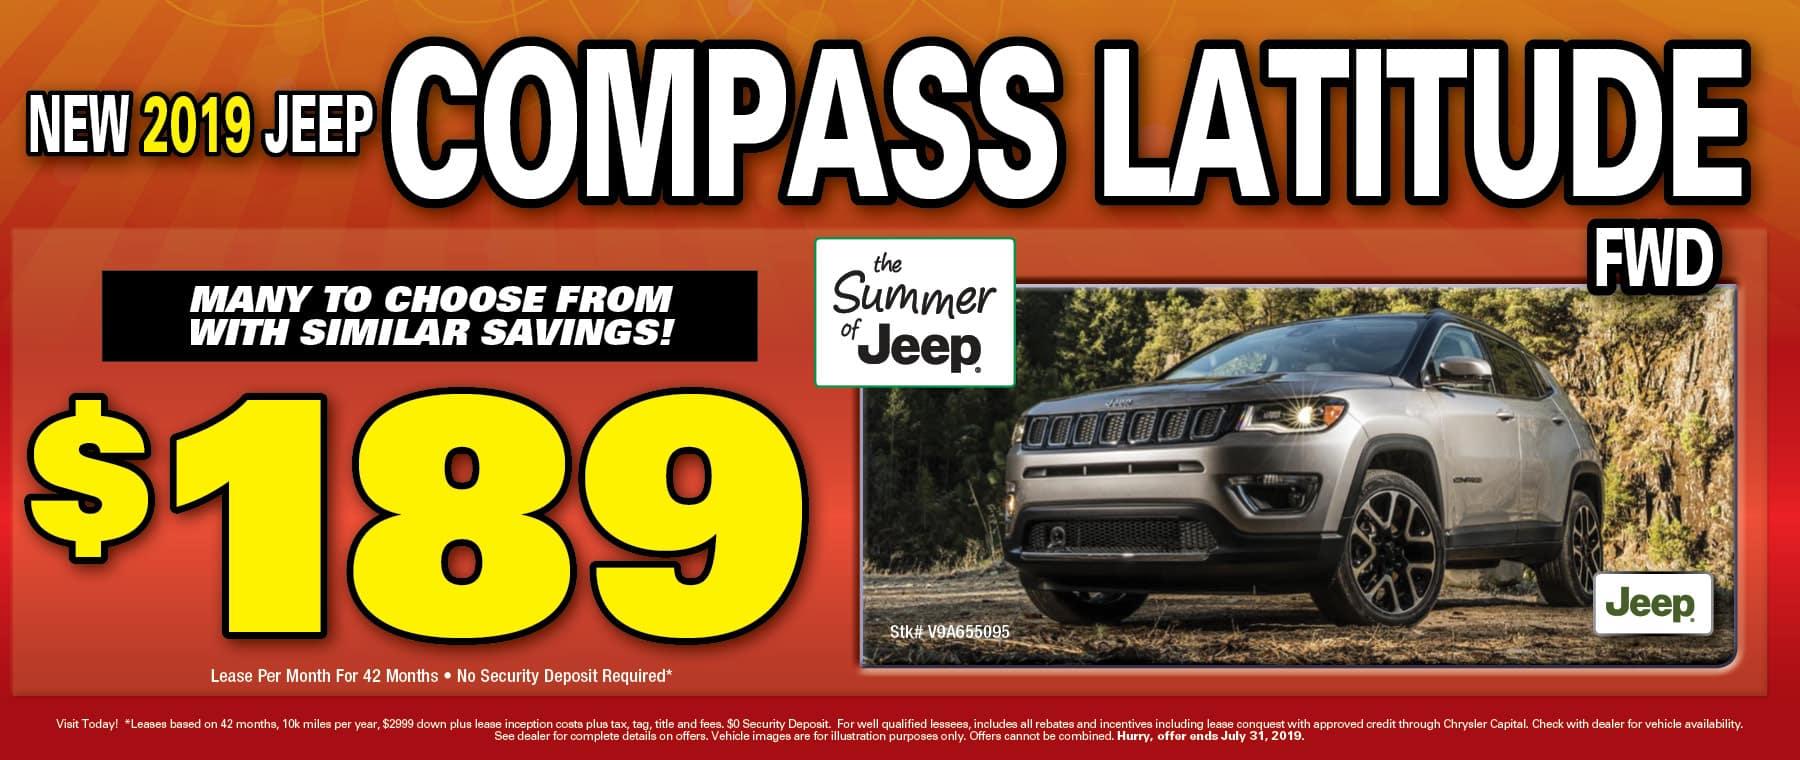 2019 Jeep Compass!